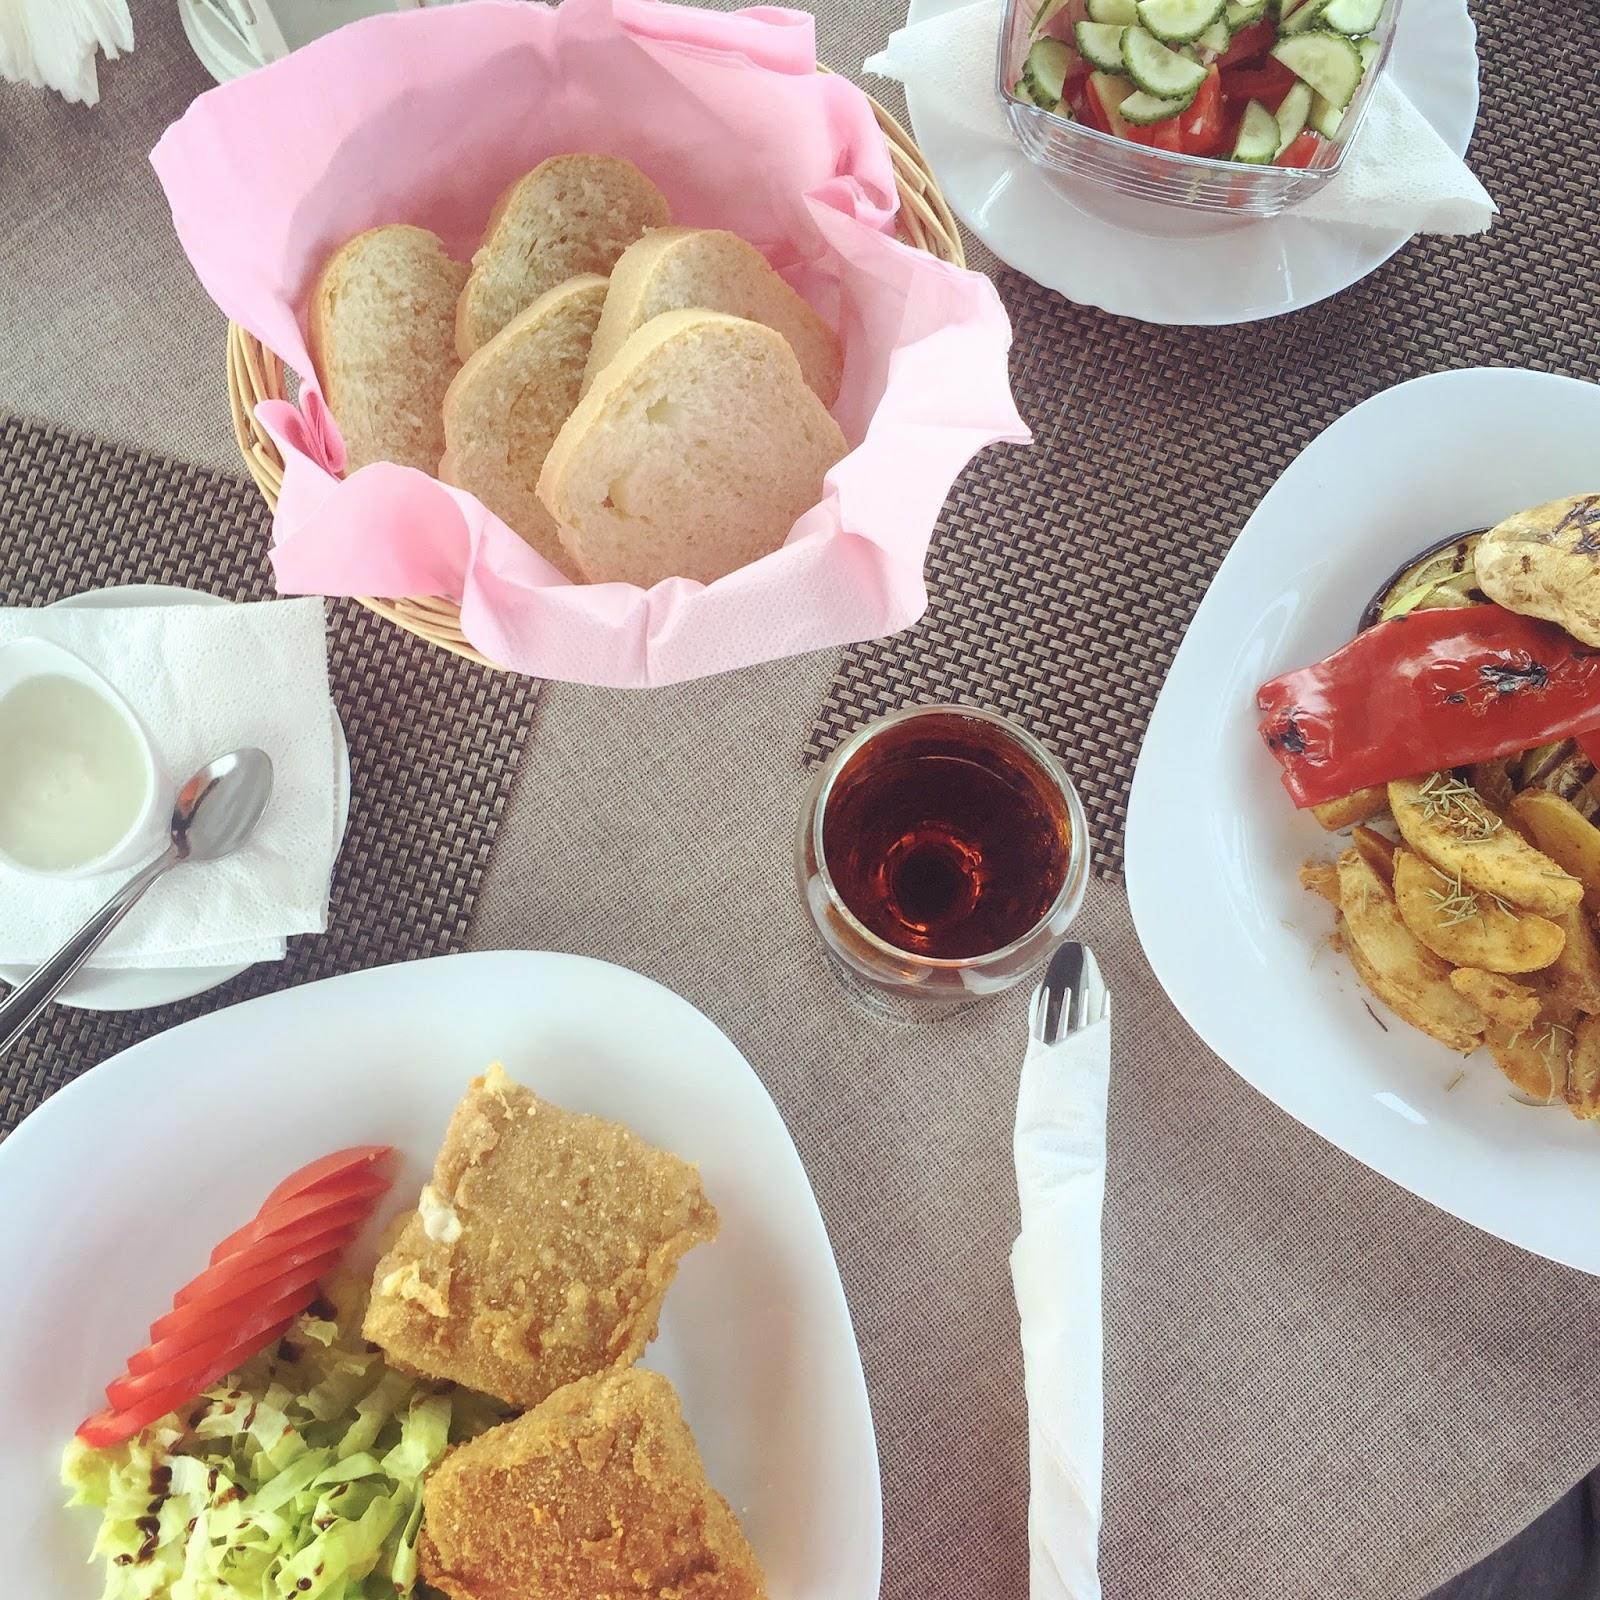 Formidable Joy | UK Fashion, Beauty & Lifestyle Blog | Romania | Vegan | Vegan Eating | Mondrian Events & Gardens